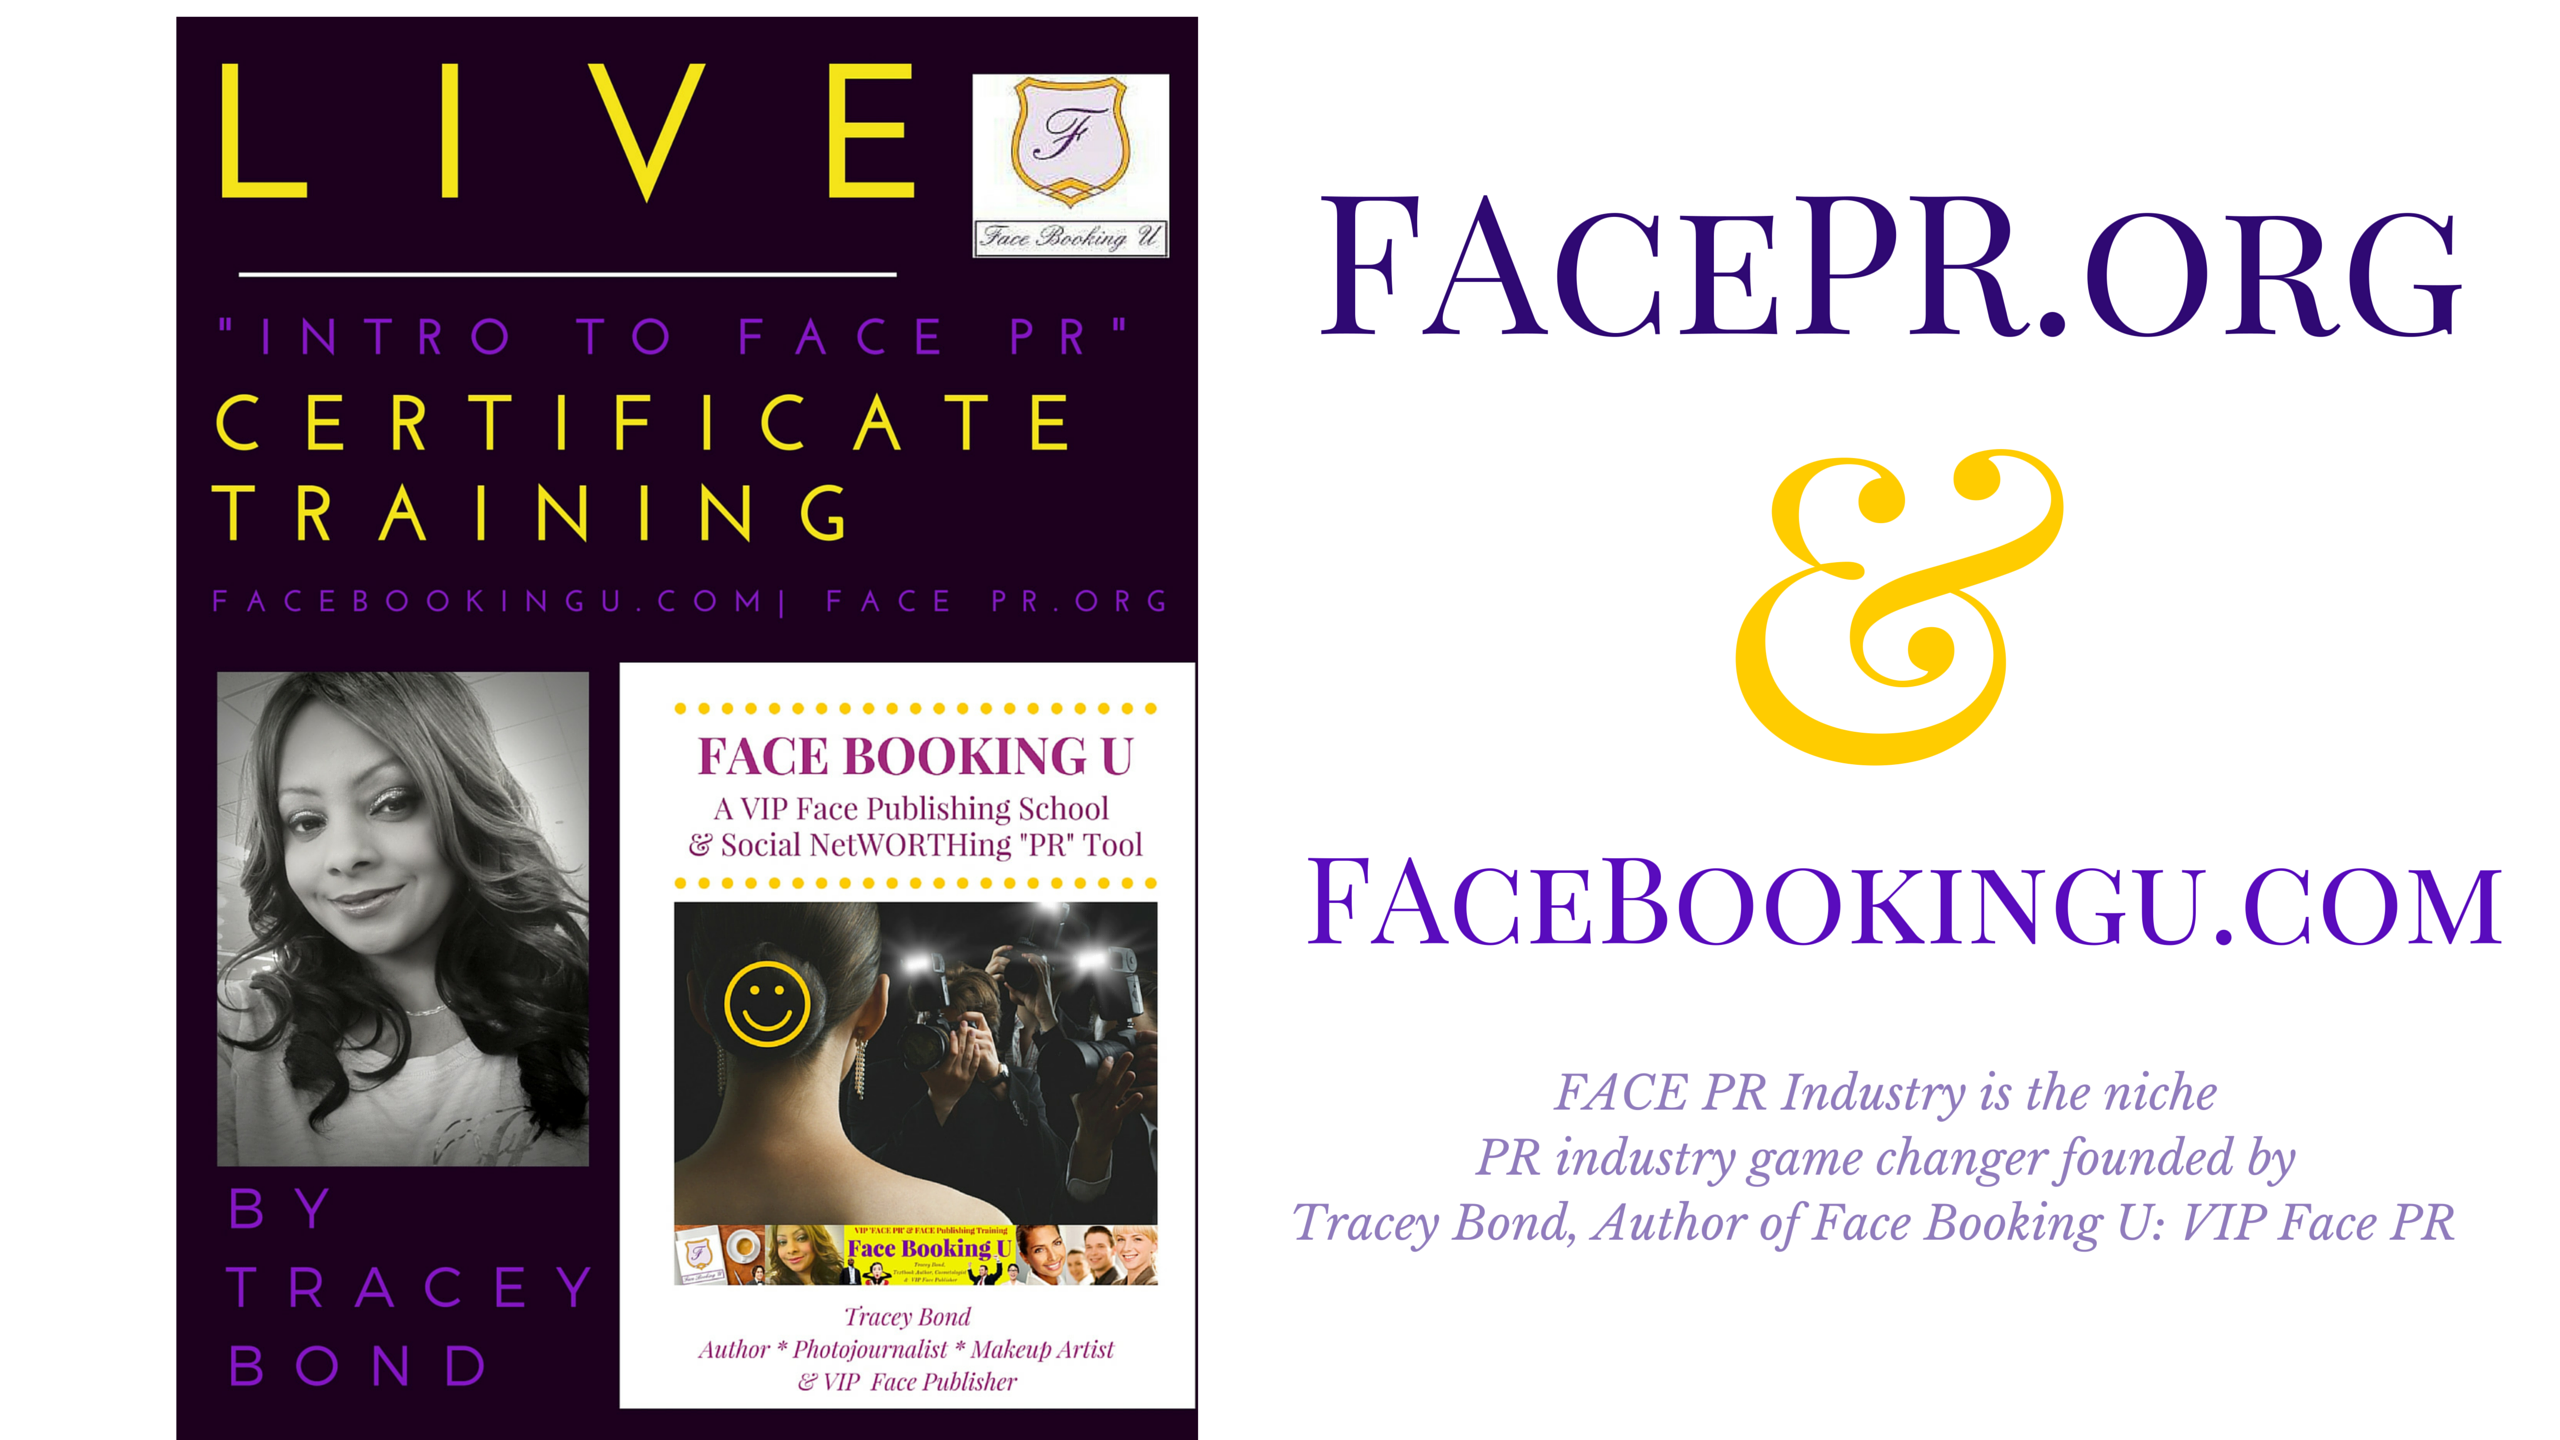 Face Pr Industry At Facepr Org Facebookingu Channel Art On You Tube 1